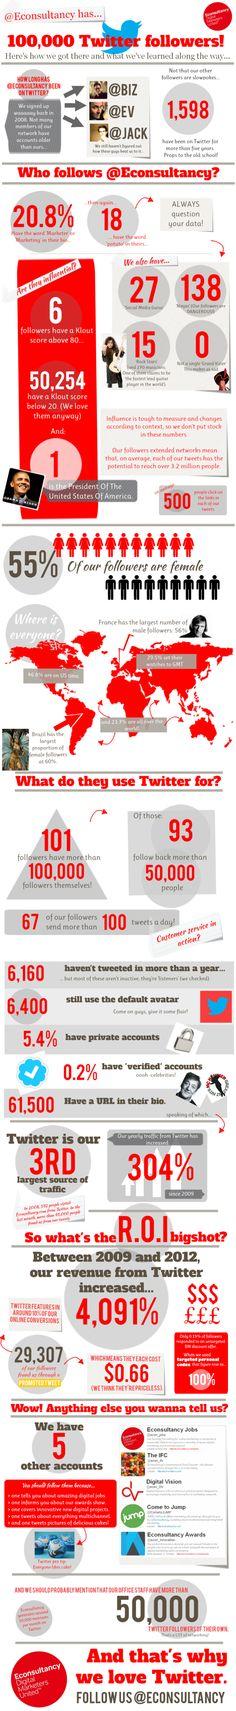 Econsultancy has 100000 twitter followers